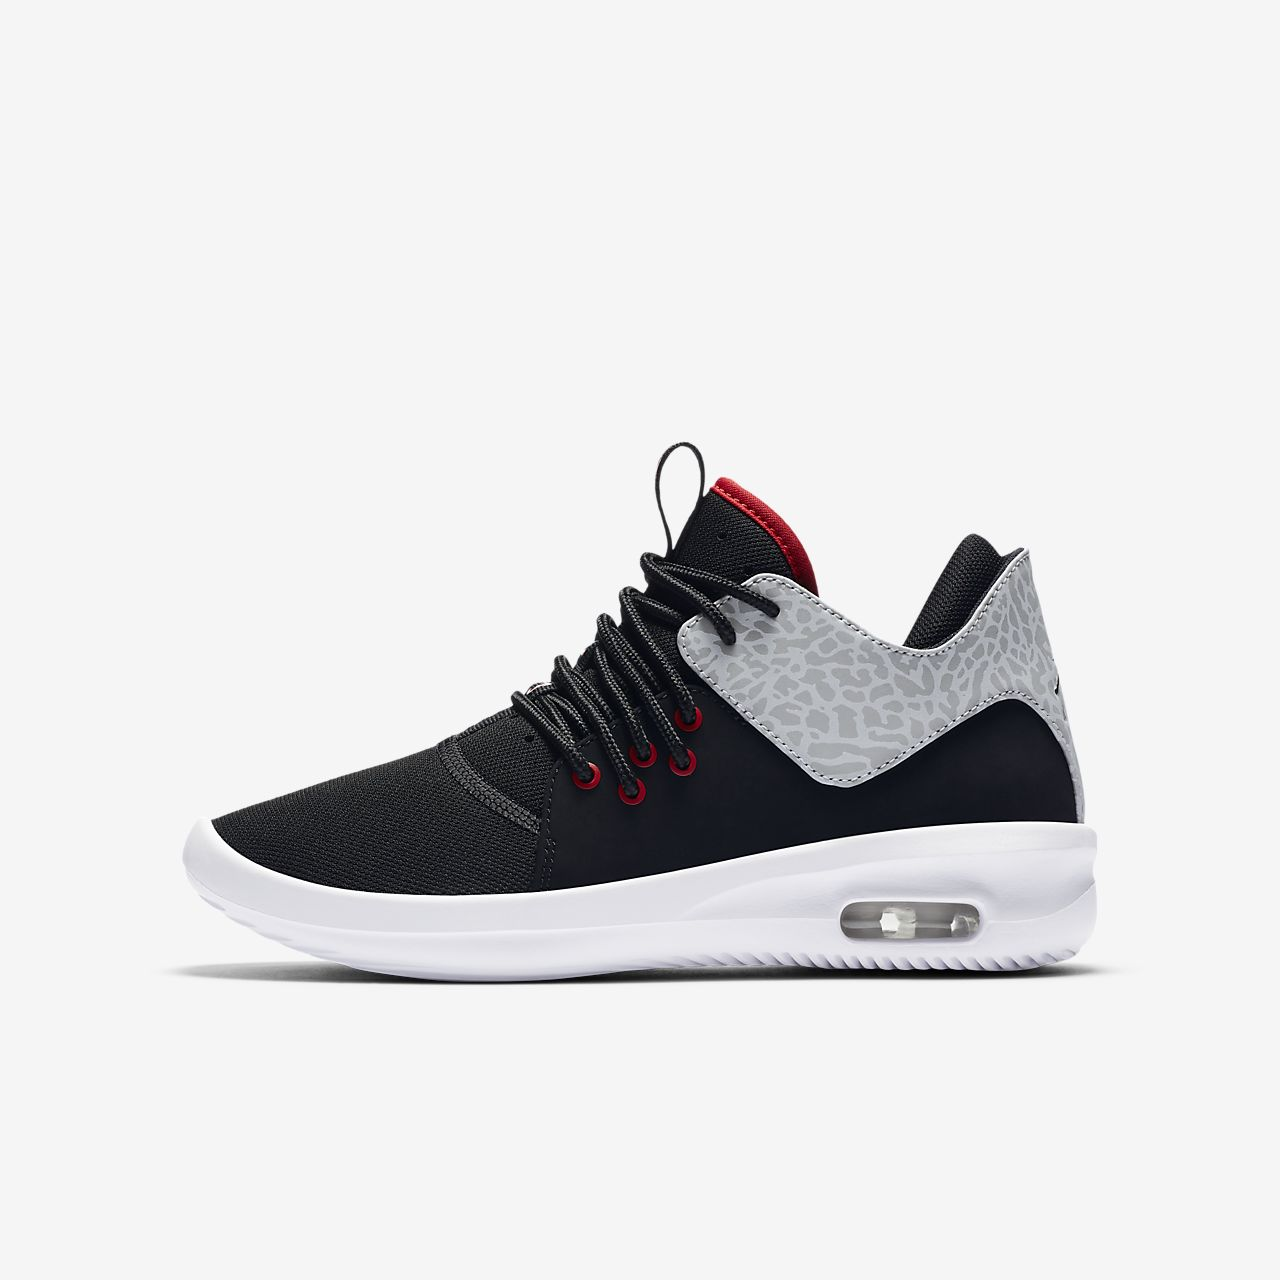 Basket Nike Air Jordan First Class Nike Pedof5A